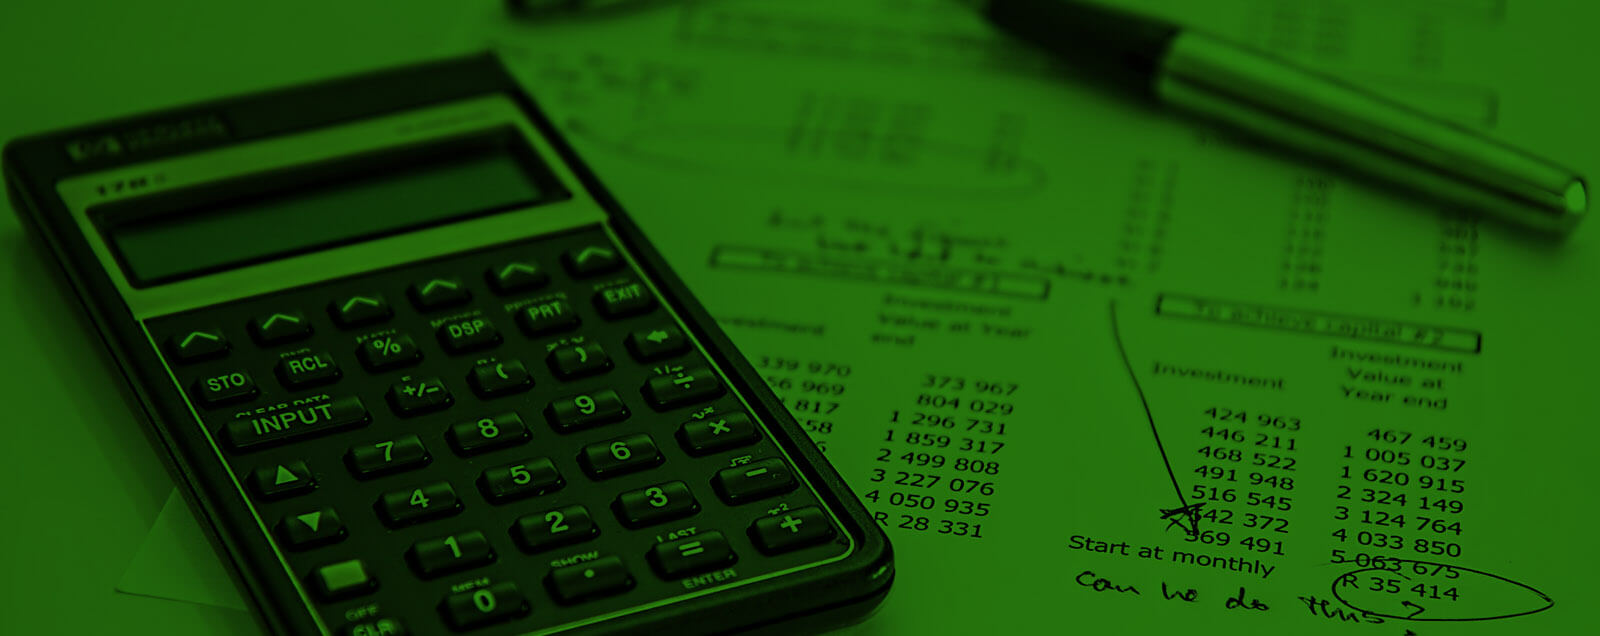 Kalkulator fotowoltaiki - domzielonejenergii.pl